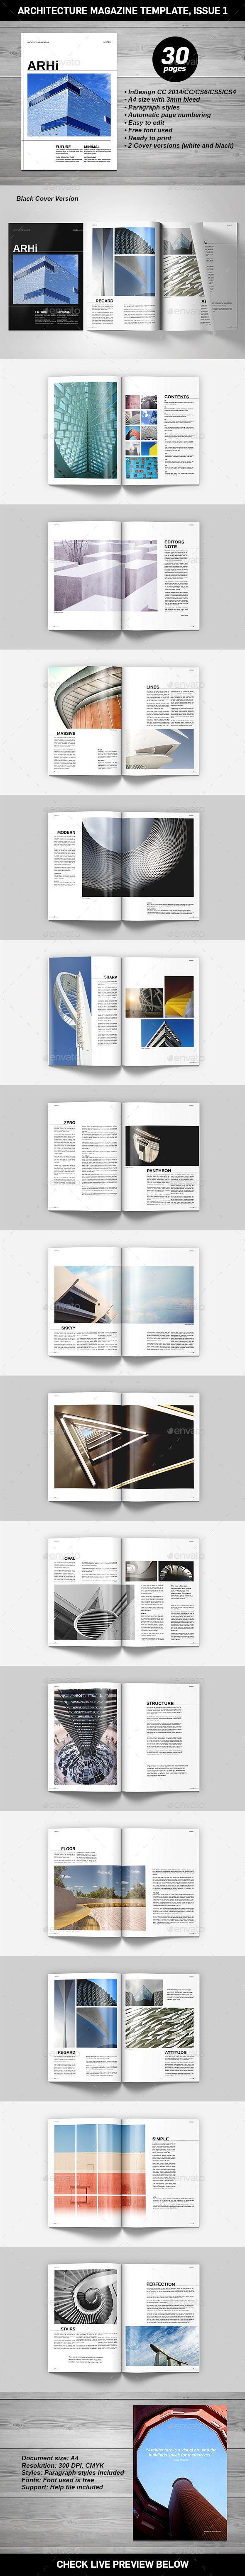 Architecture Magazine Template #design #journal Download: http://graphicriver.net/item/architecture-magazine-template/11432387?ref=ksioks